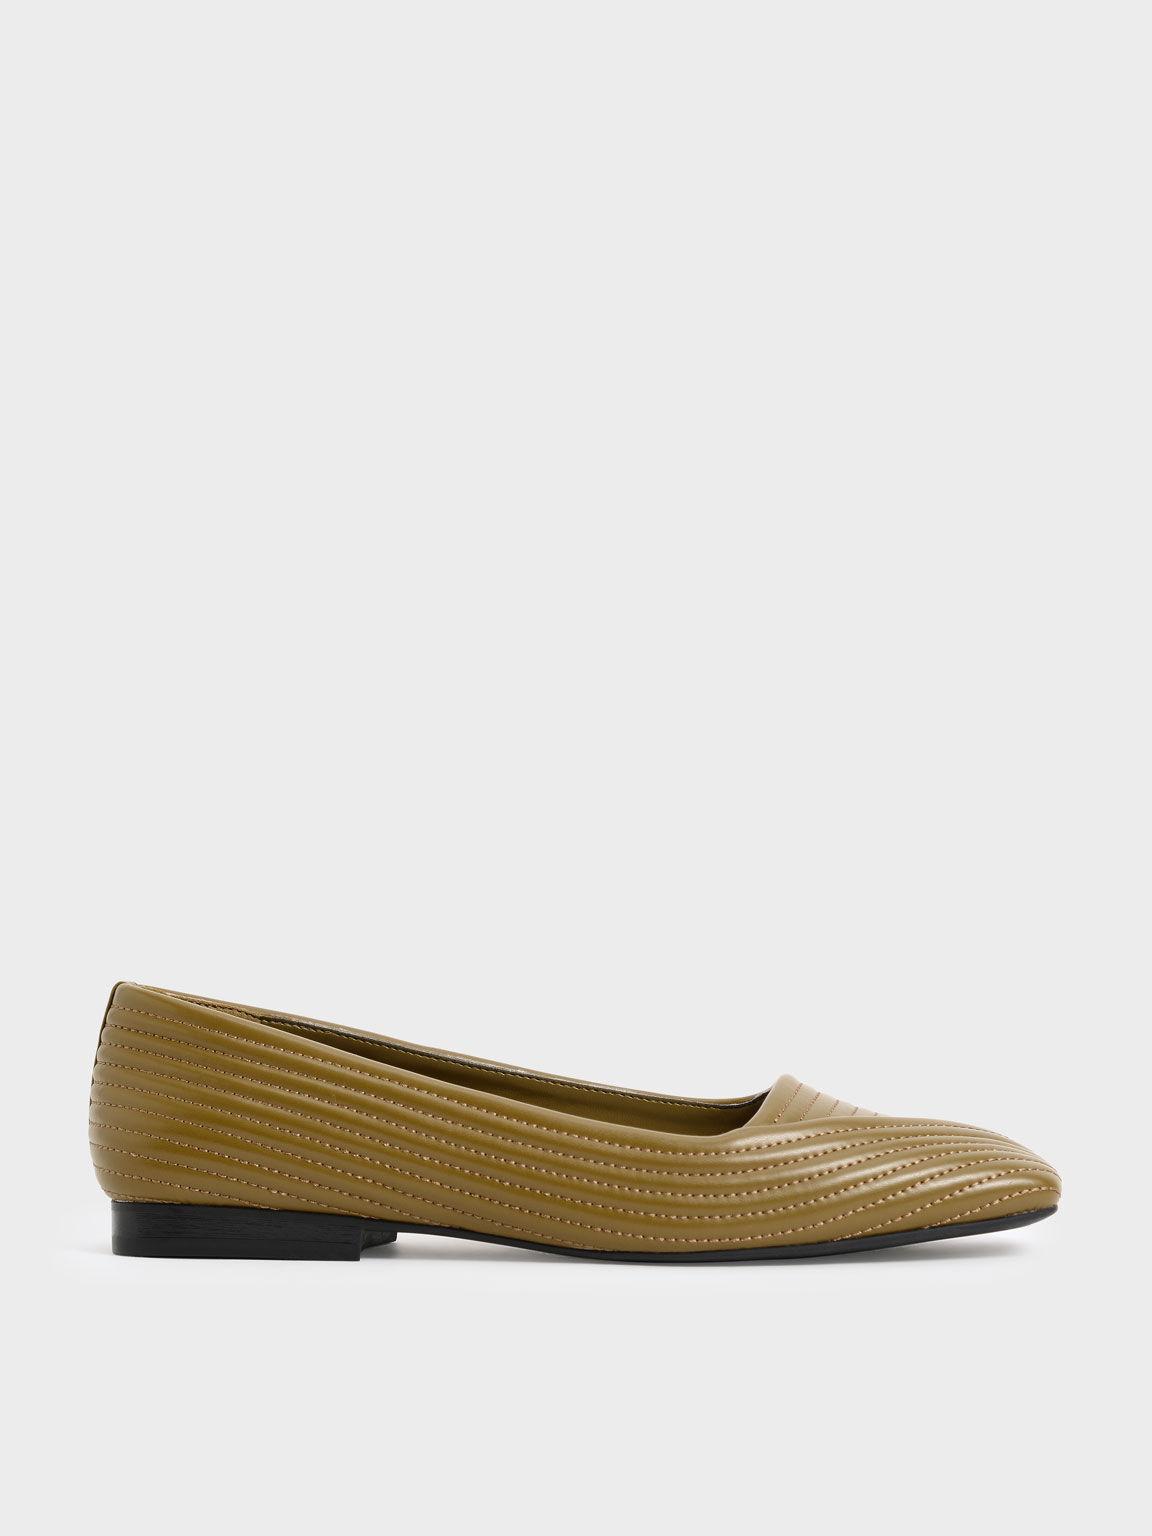 Stitch-Trim Square Toe Ballerina Flats, Olive, hi-res